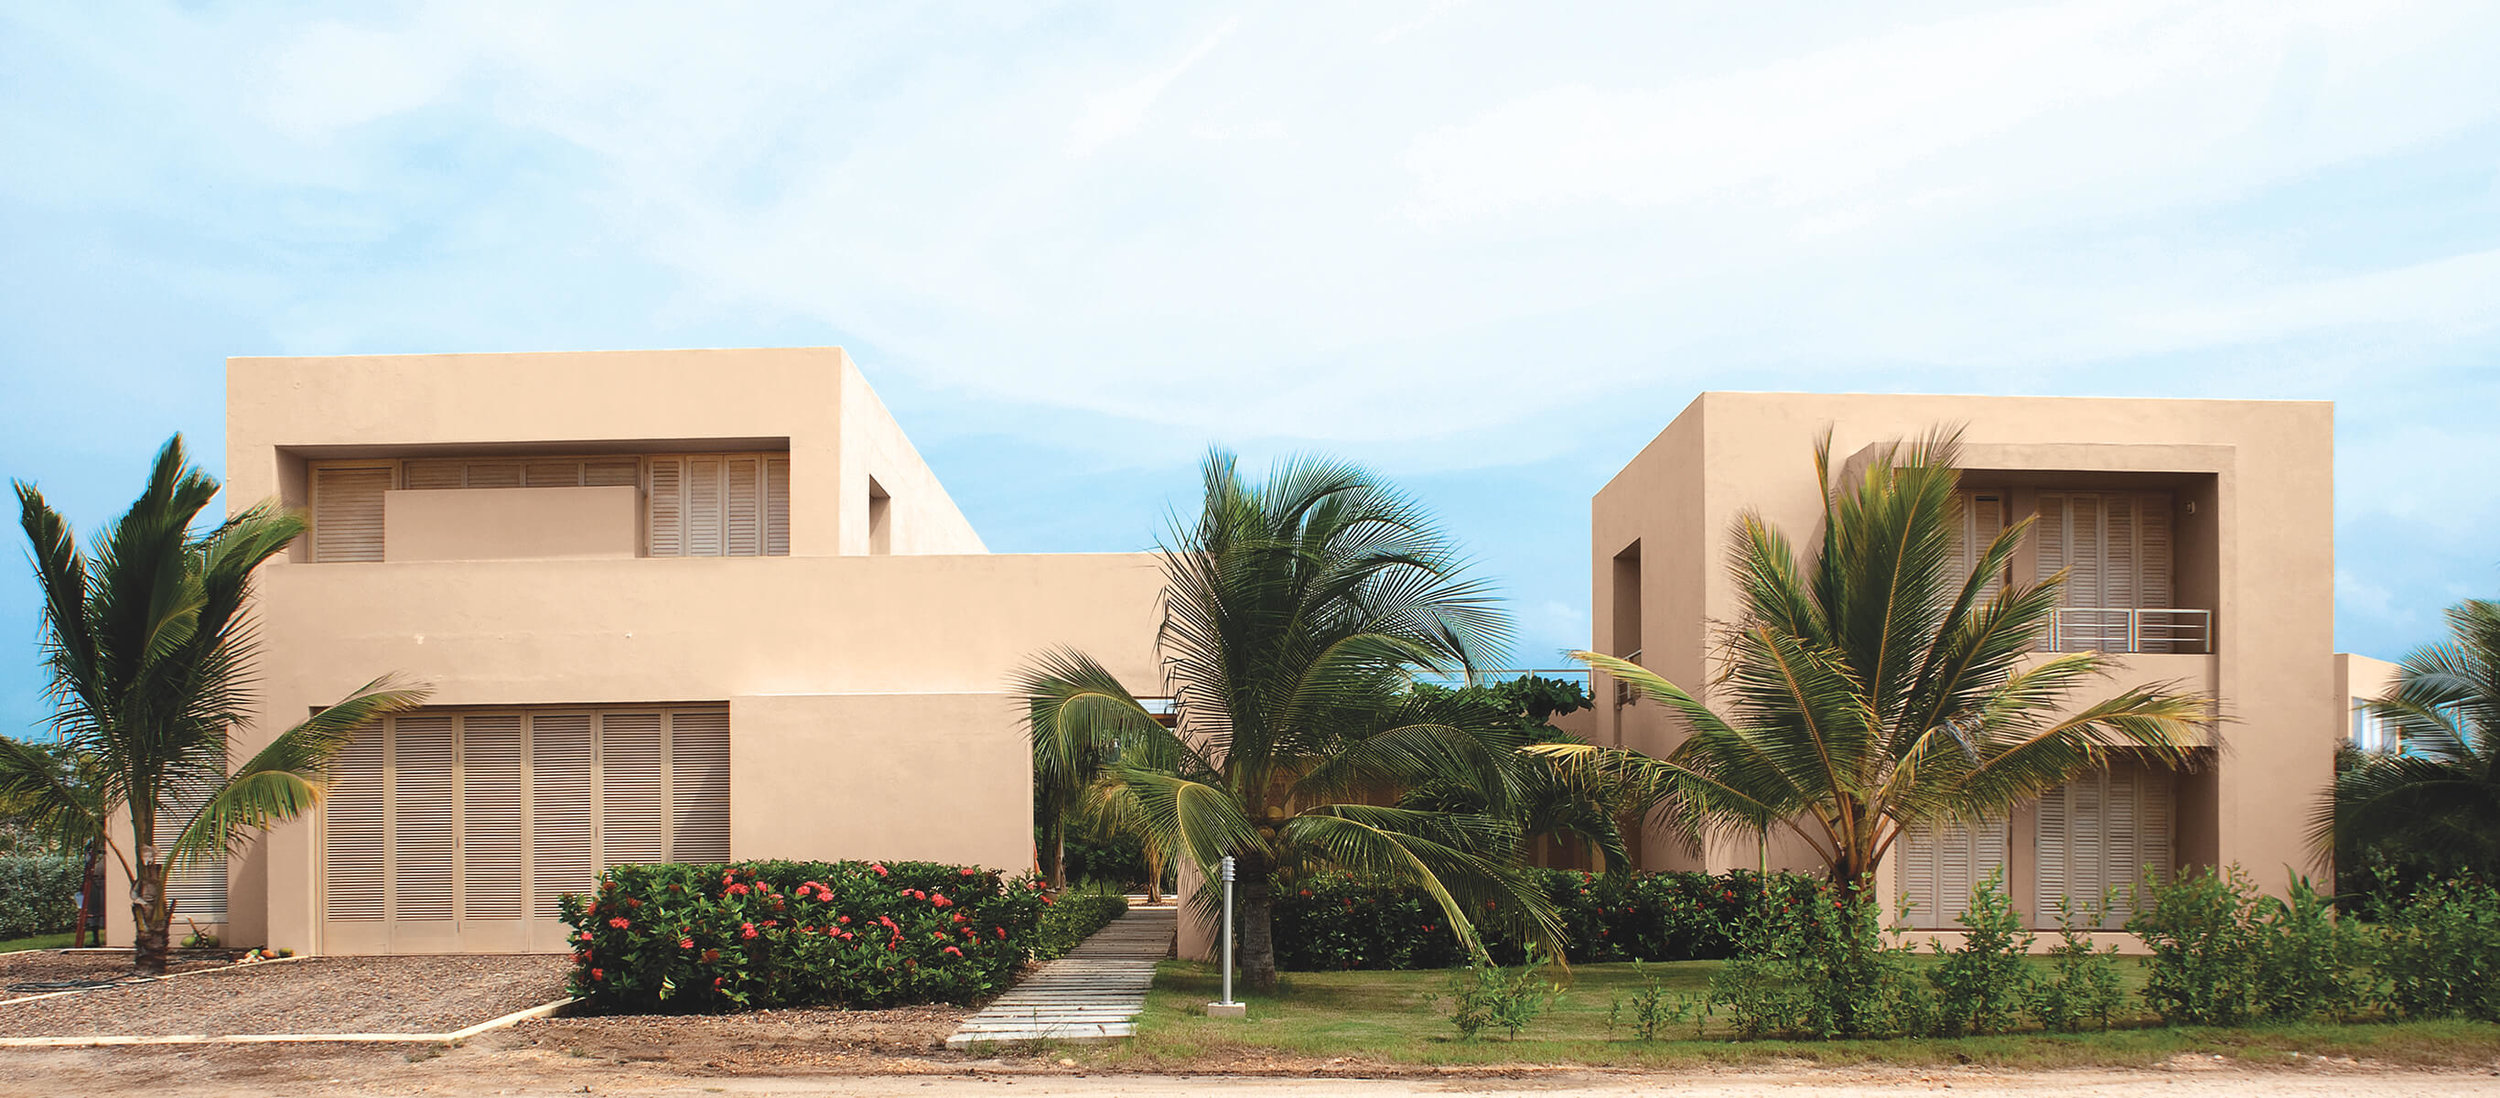 rir-arquitectos-1234.jpg